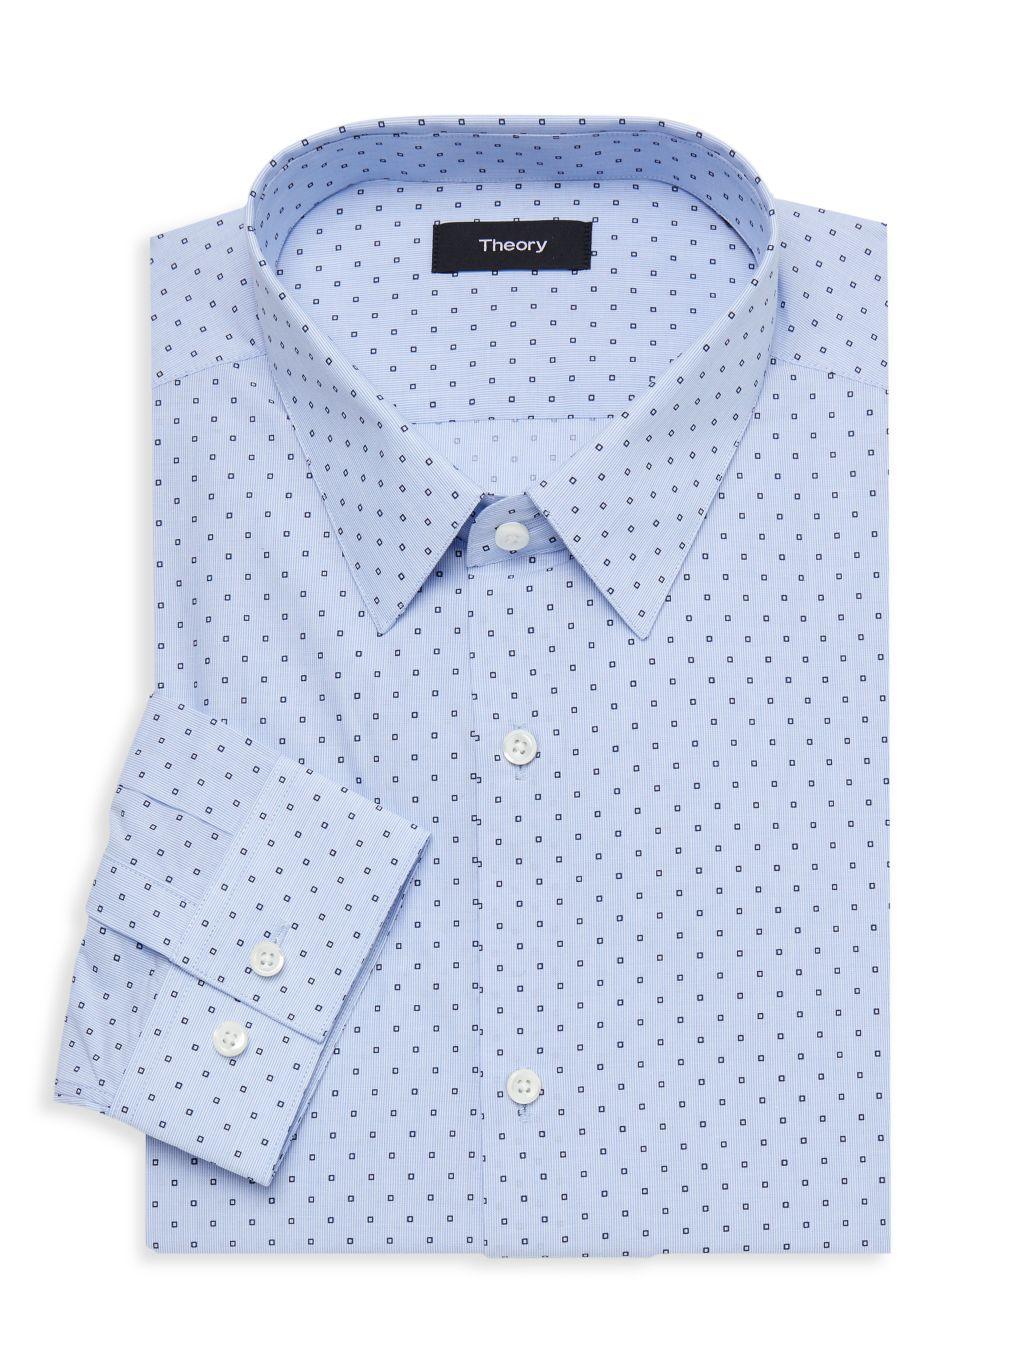 Theory Square-Print Long-Sleeve Dress Shirt